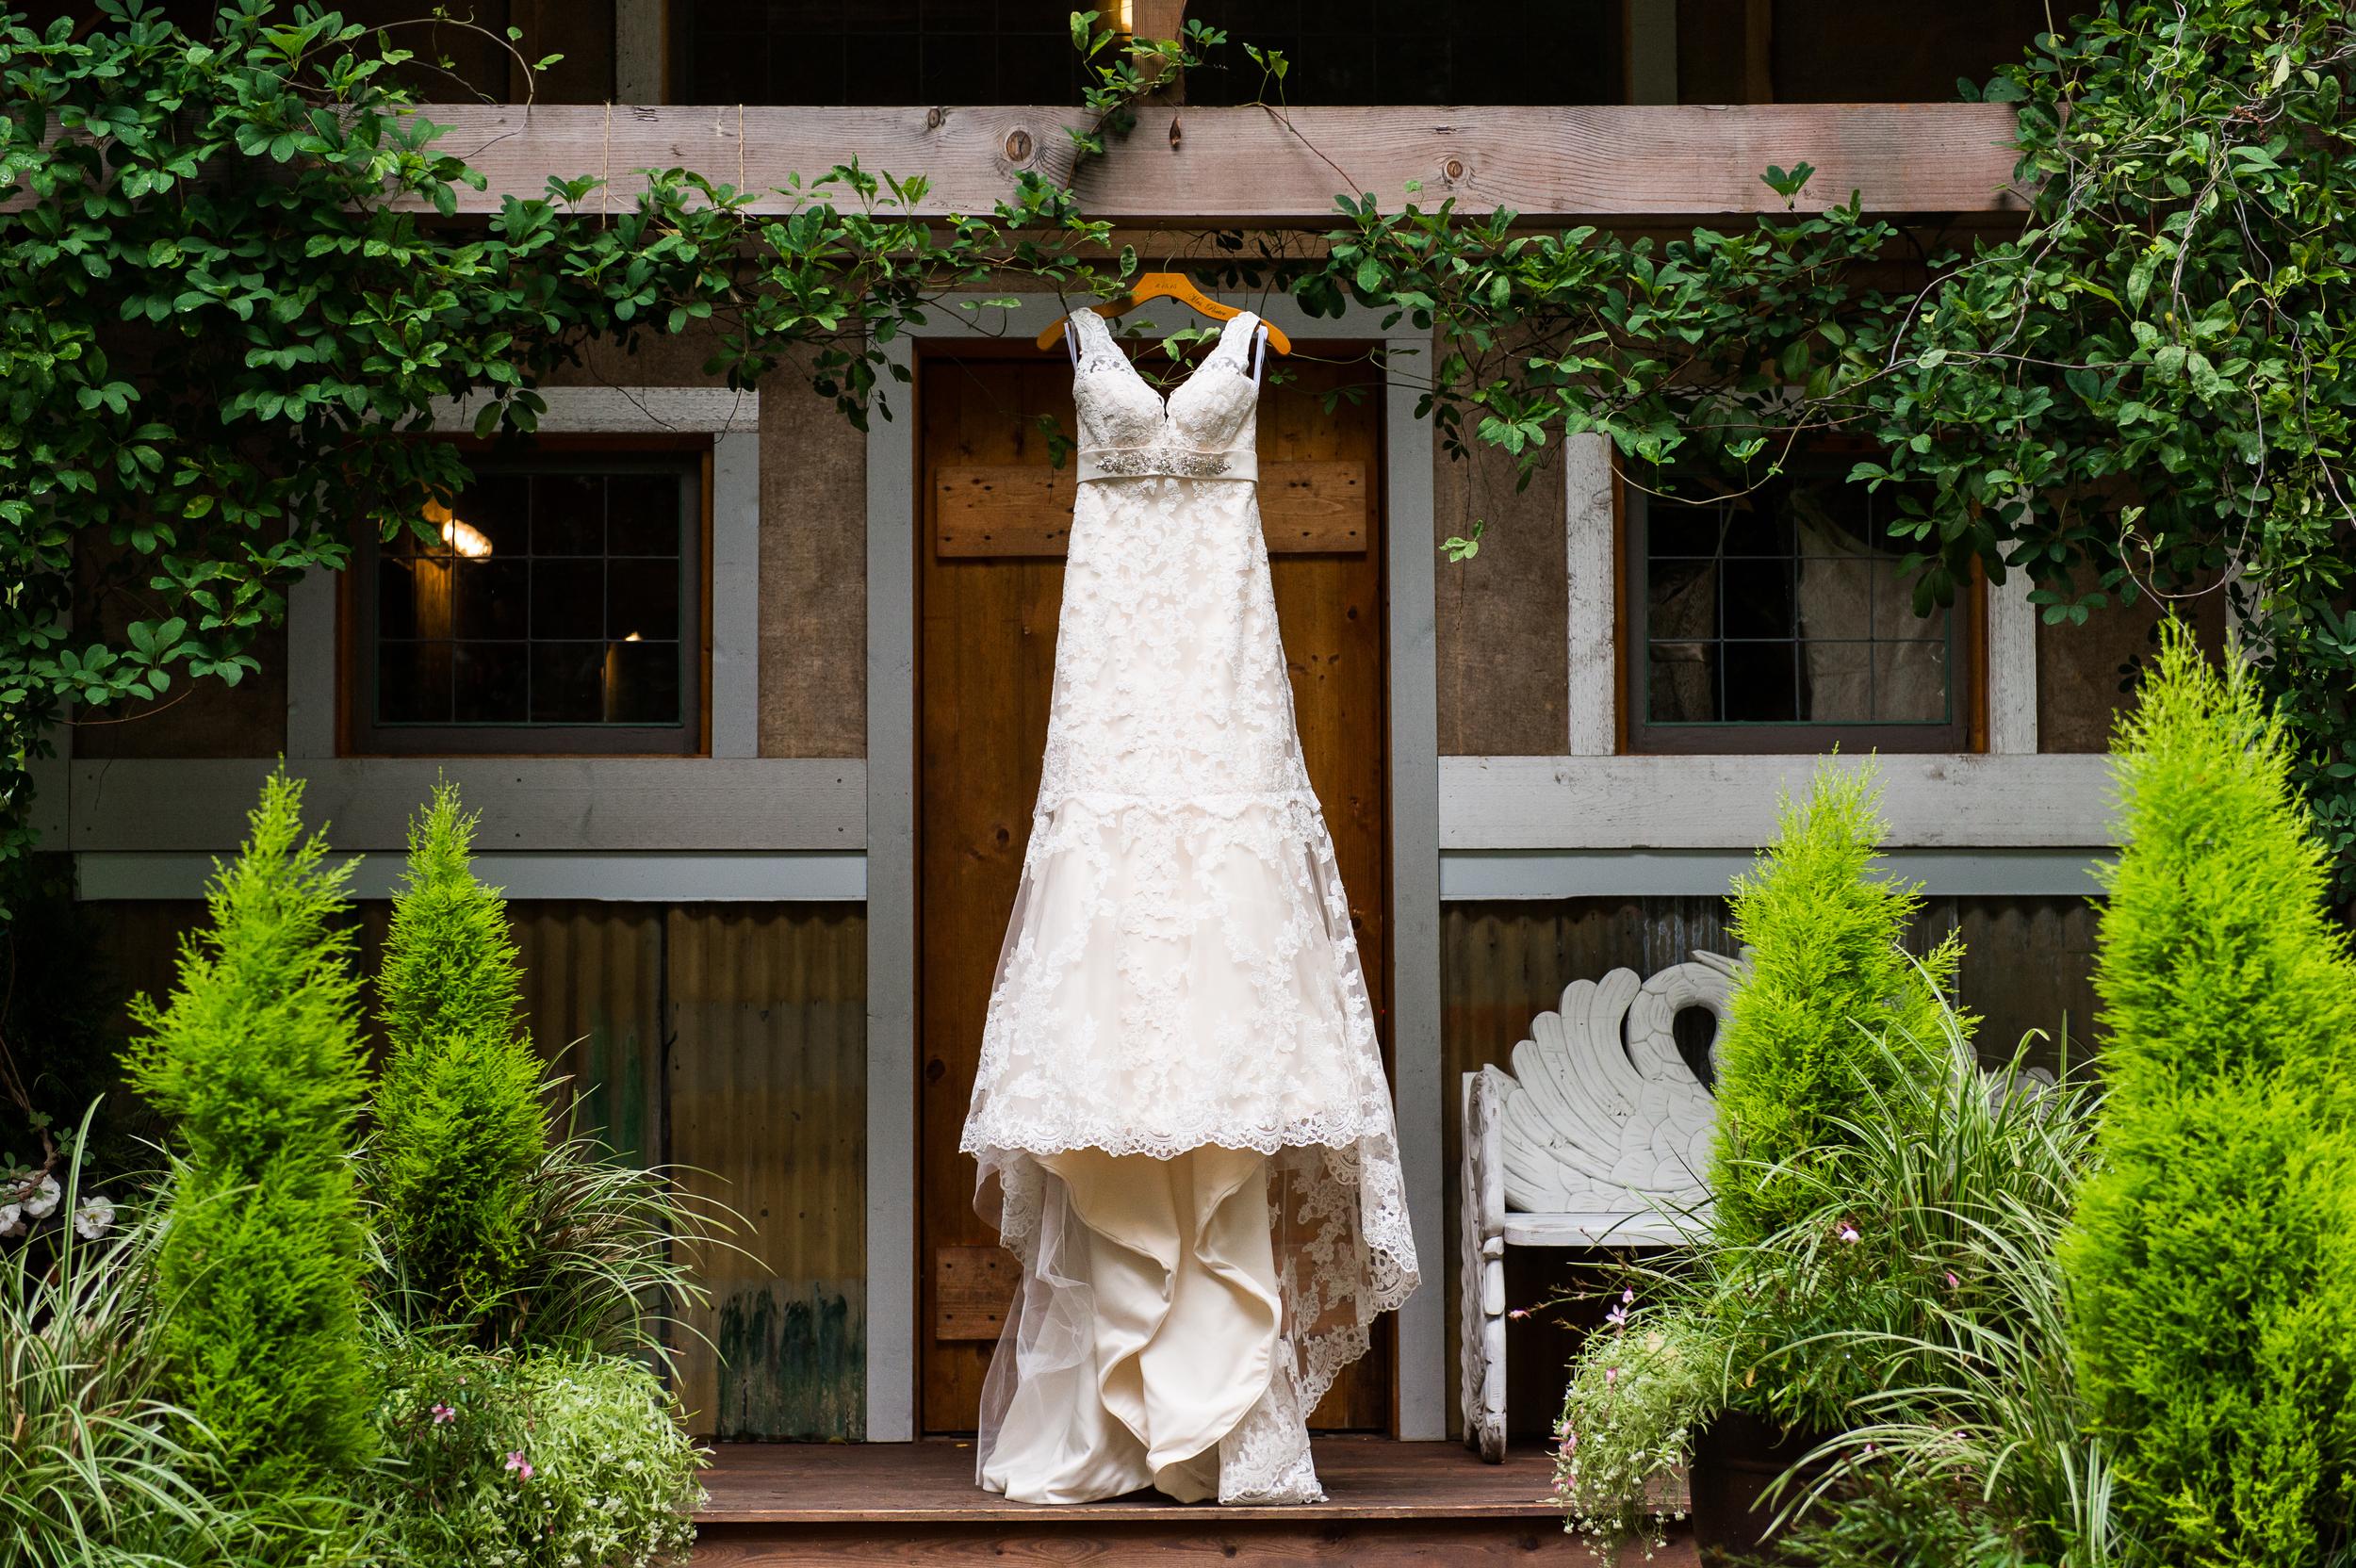 JJ-wedding-Van-Wyhe-Photography-039.jpg